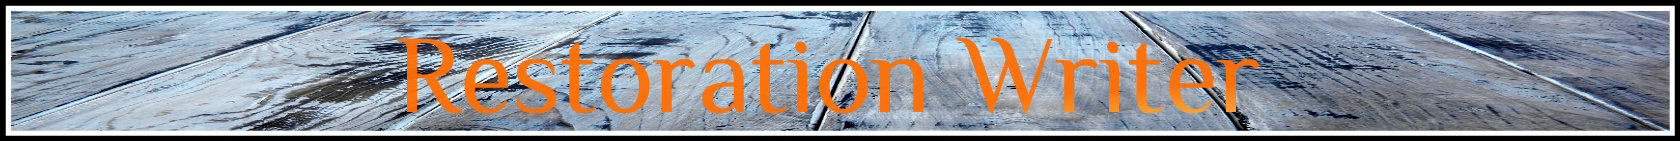 Restoration Writer